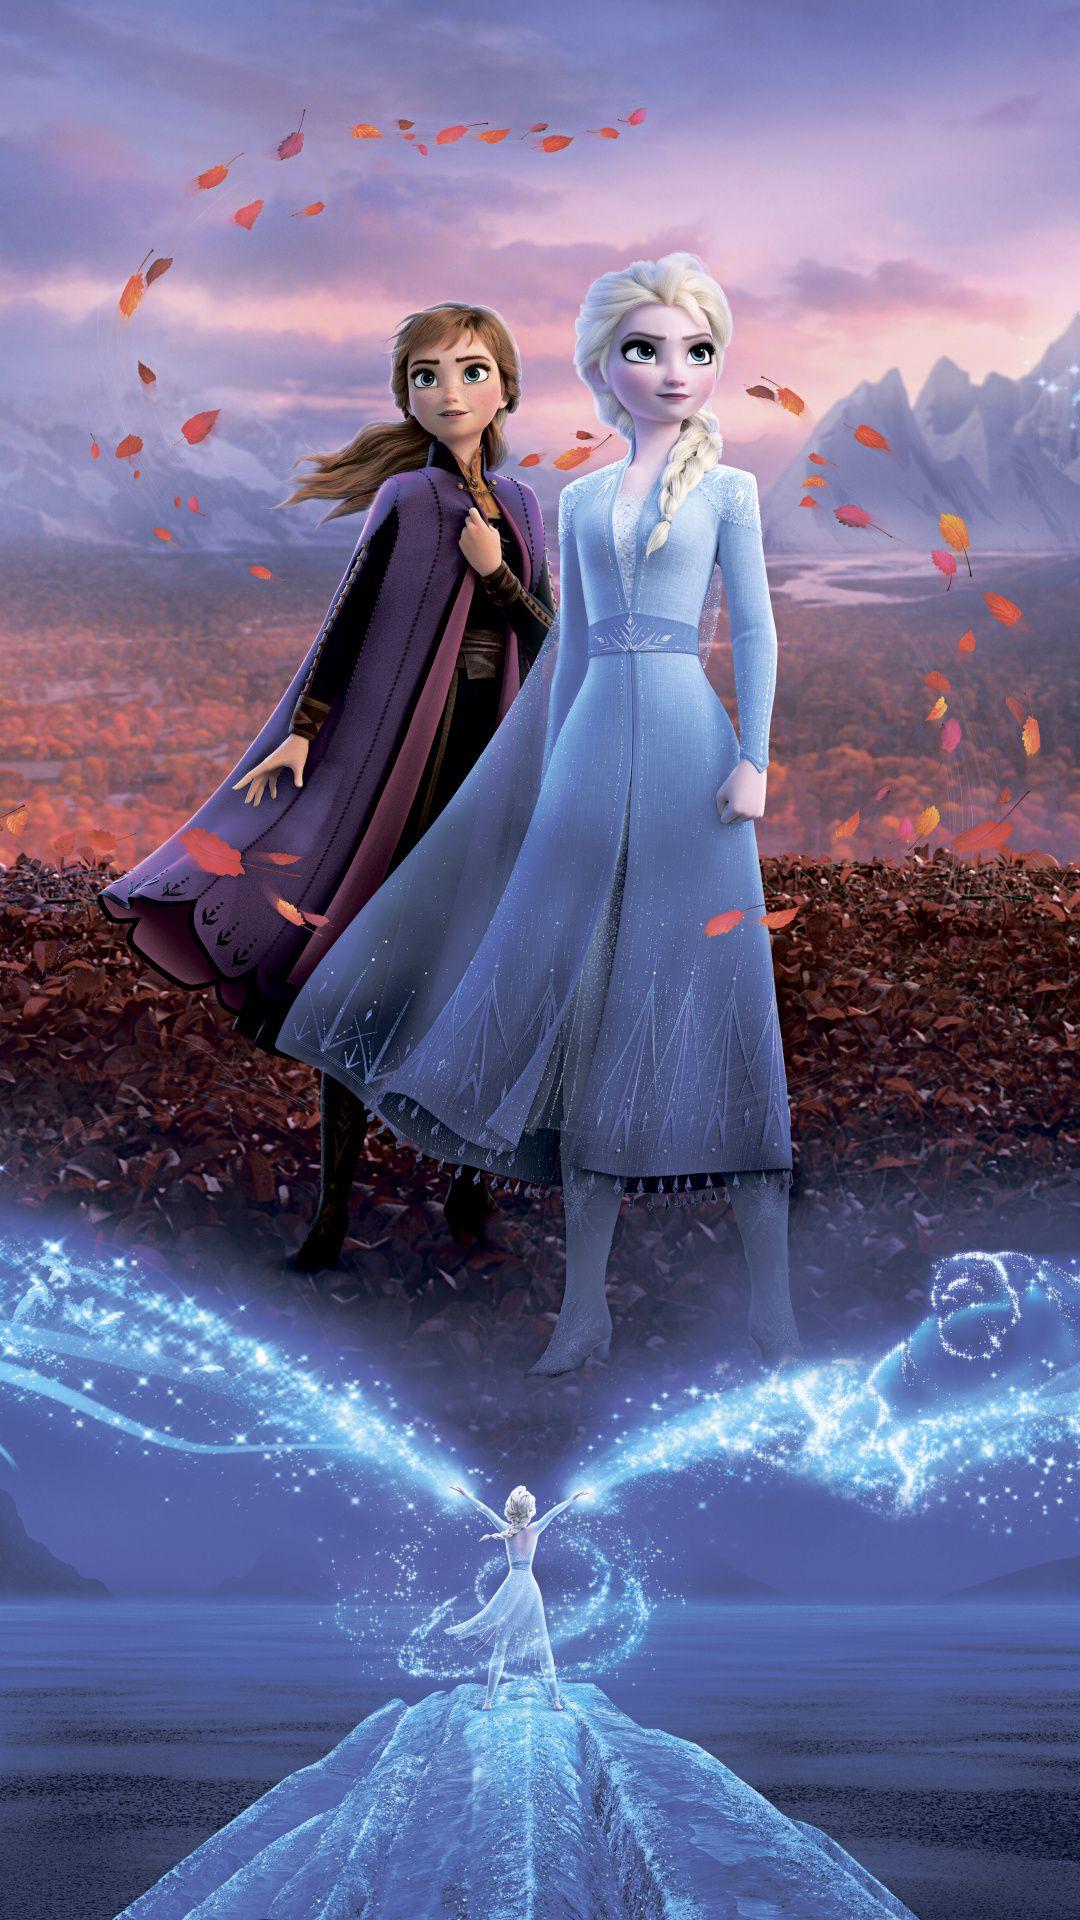 Frozen 2 Movies 2019 Movies Hd Disney Poster Frozen 2 Wallpaper Iphone 720x1280 Download Hd Wallpaper Wallpapertip